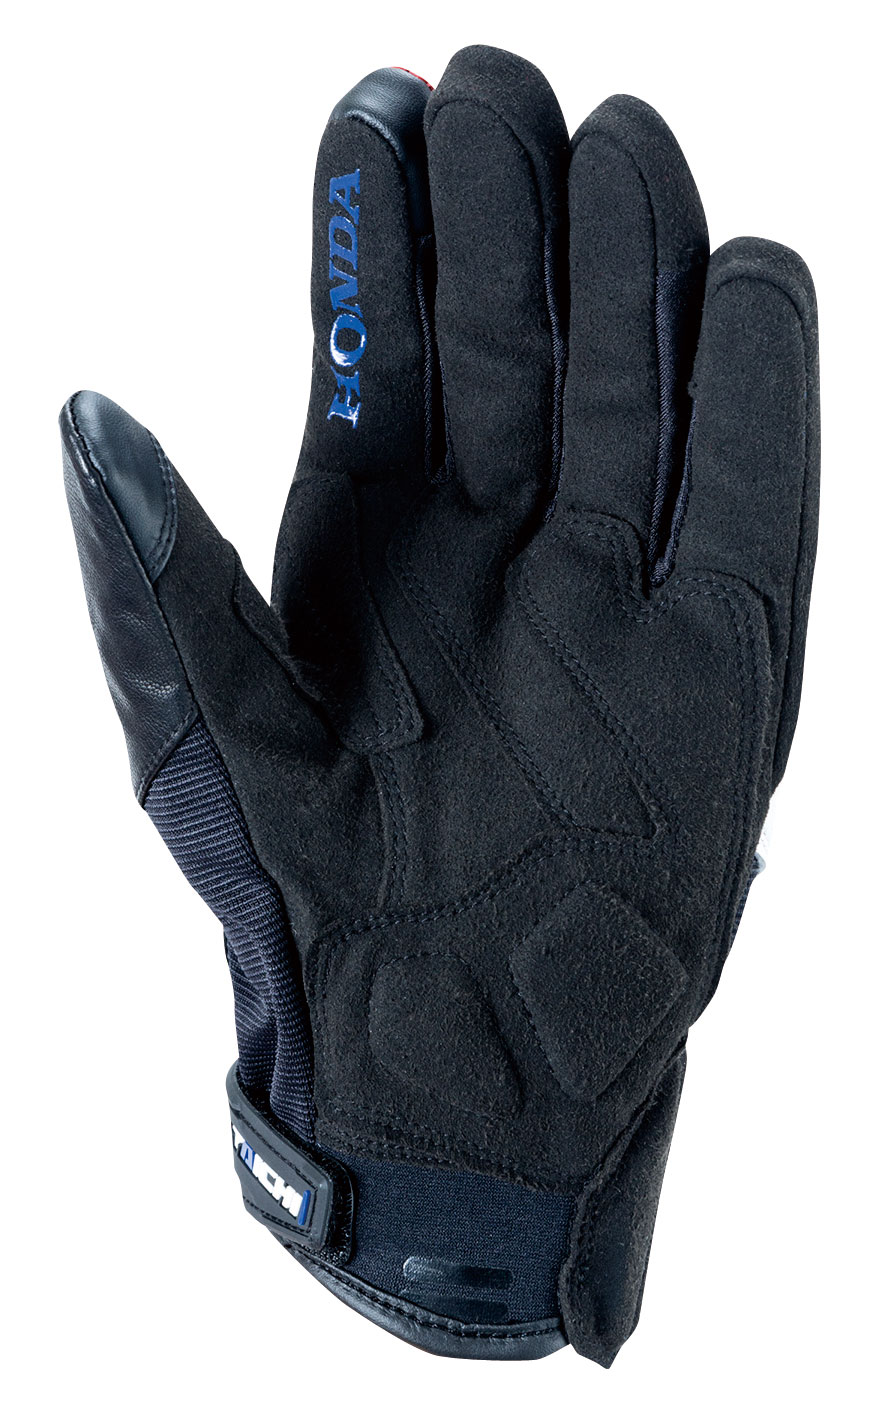 【HONDA RIDING GEAR】【Honda×RS Taichi】護甲冬季手套 - 「Webike-摩托百貨」